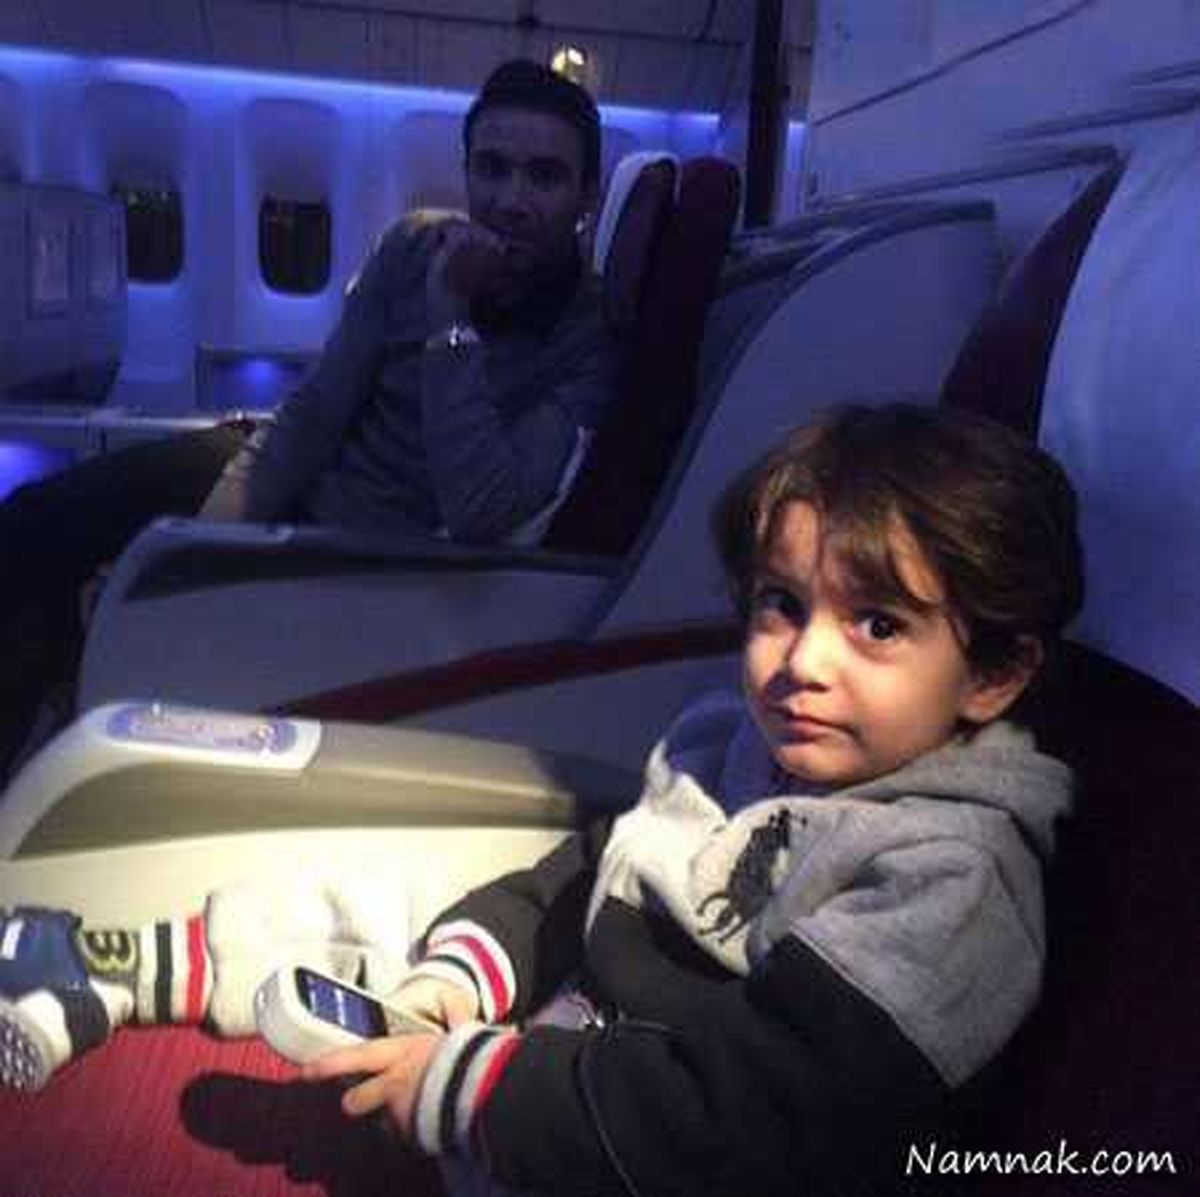 جواد نکونام و پسرش سوار بر هواپیمای فوق لاکچری + عکس